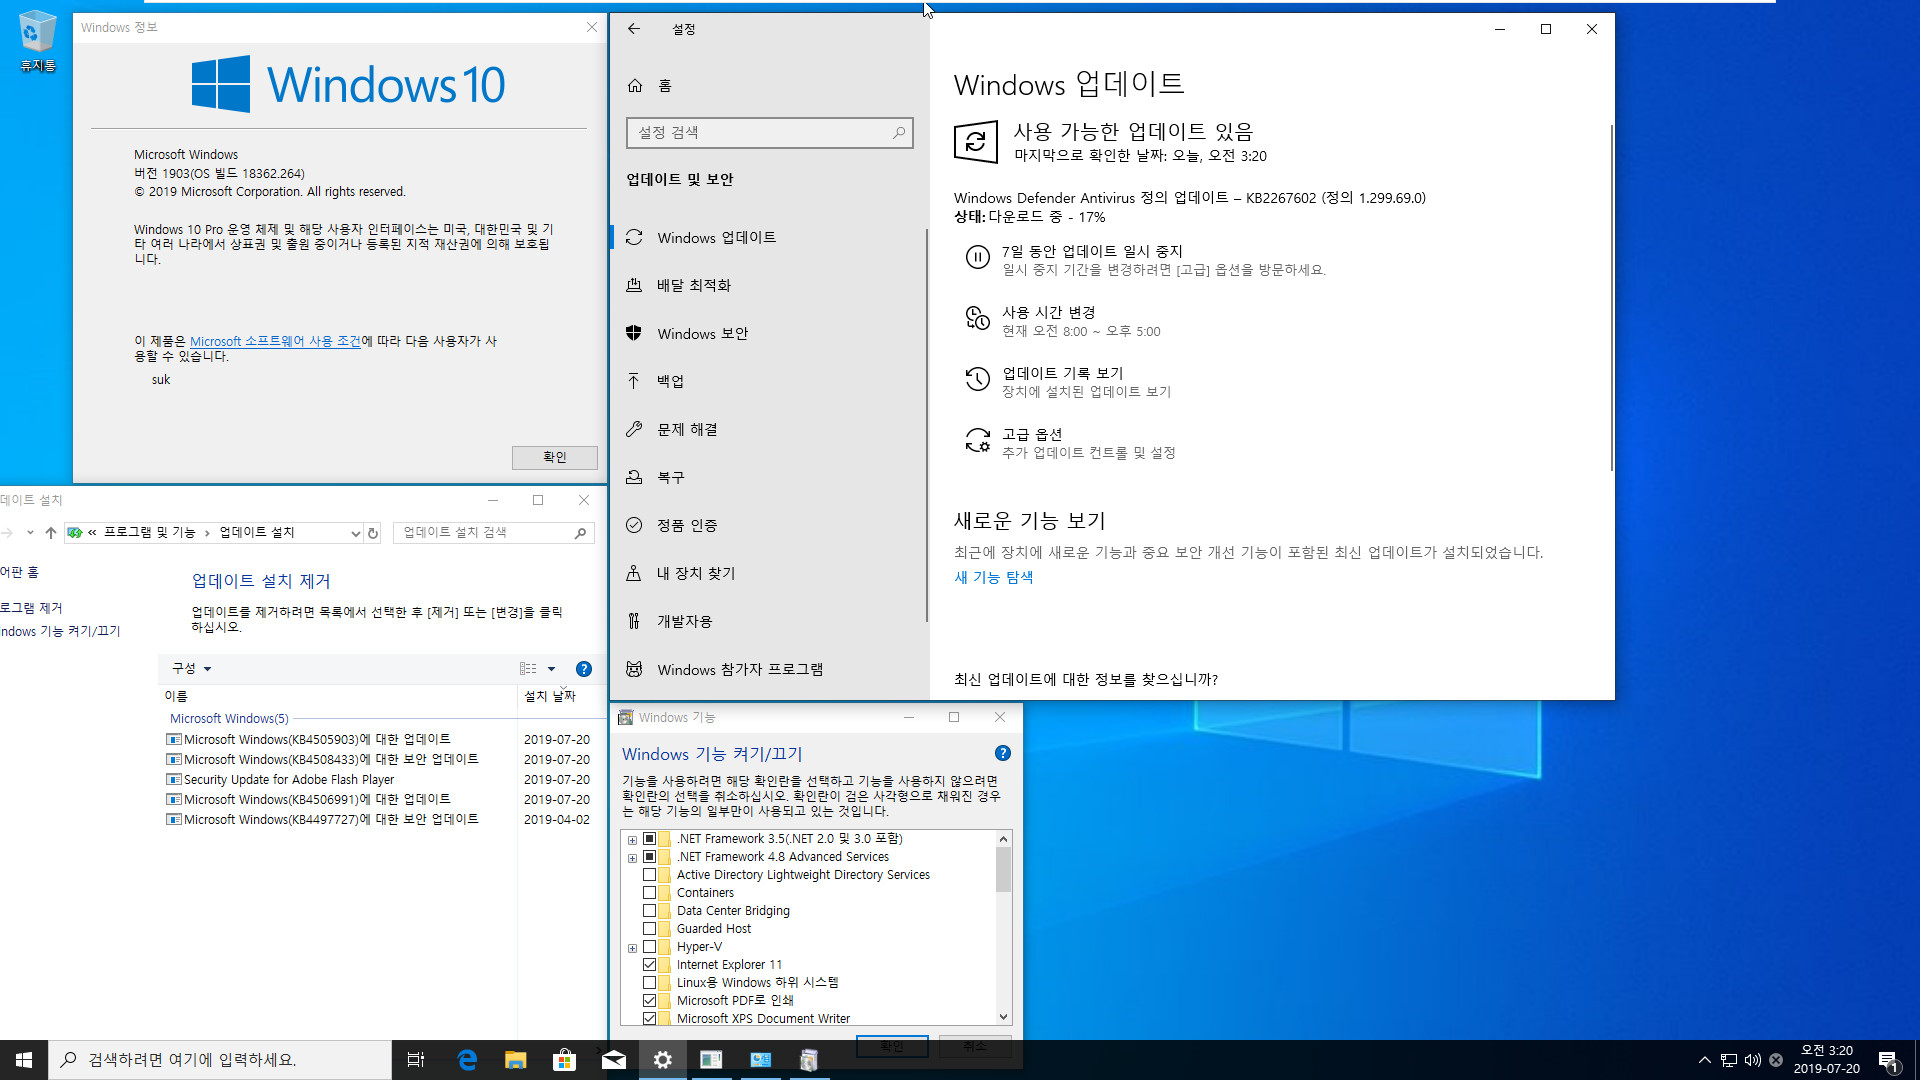 Windows 10 버전 1903 누적 업데이트 KB4505903 (OS 빌드 18362.264) [2019-07-19 일자] - 인사이더 프리뷰용 - 나왔네요. 프로 64비트만 통합중 입니다 2019-07-20_032051.jpg